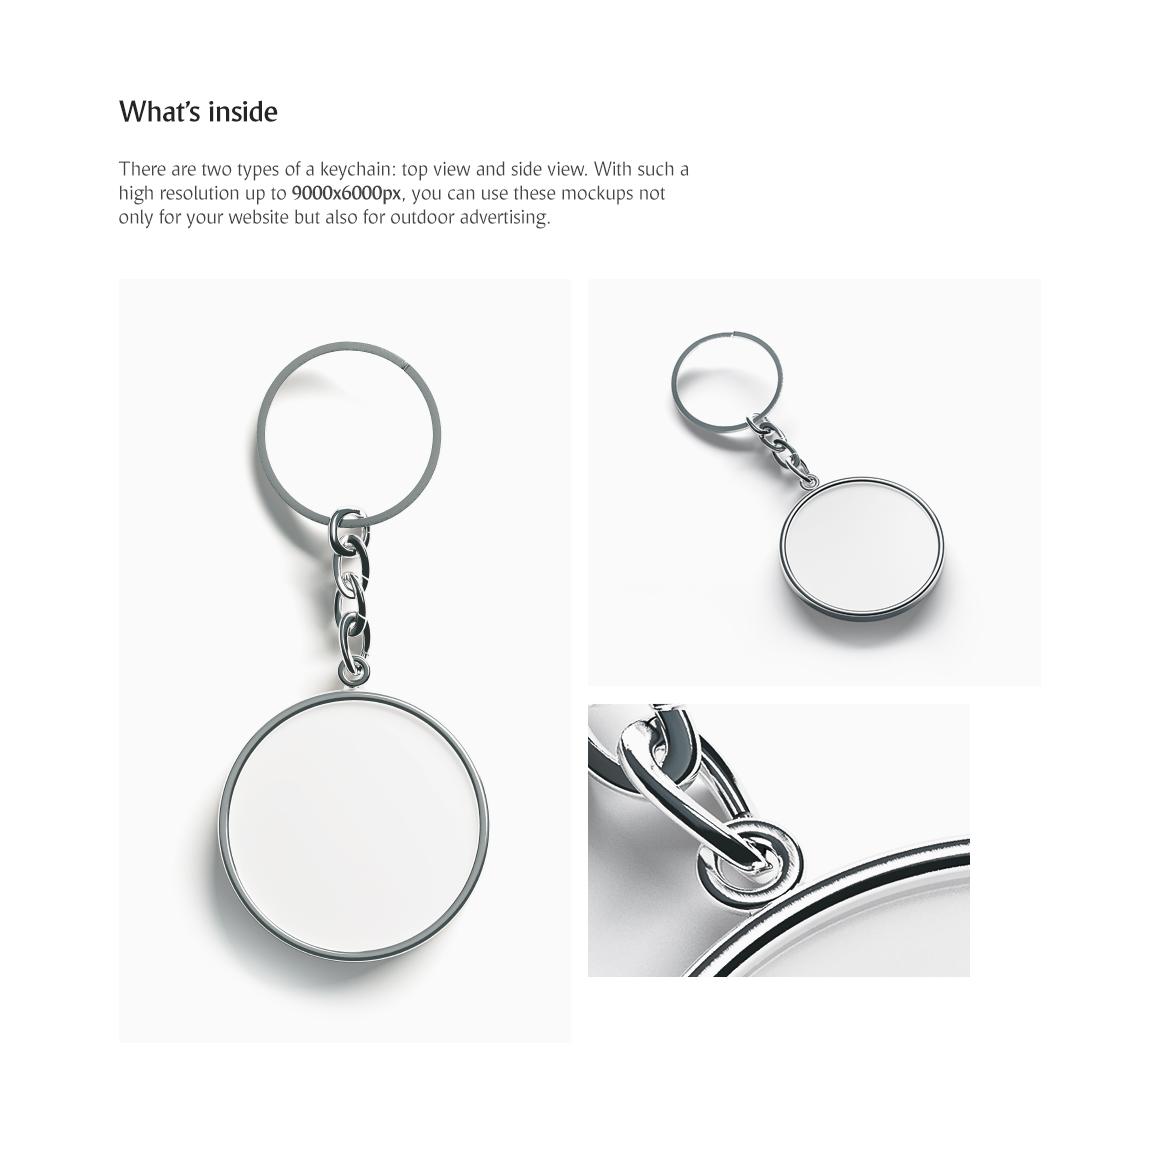 Round Keychain Product Mockups